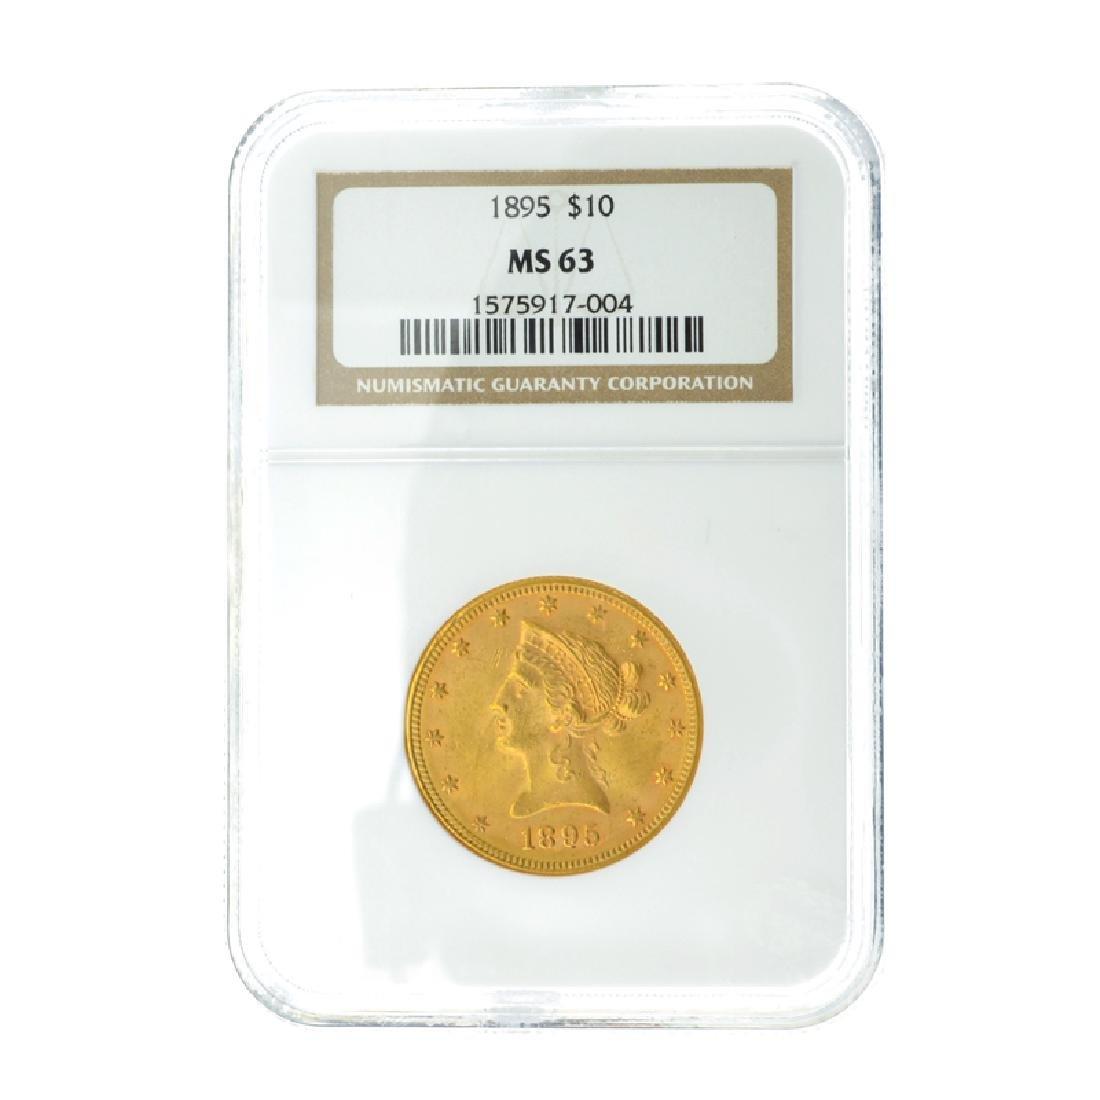 *1895 $10 U.S. MS 63 Liberty Head Gold Coin (DF)